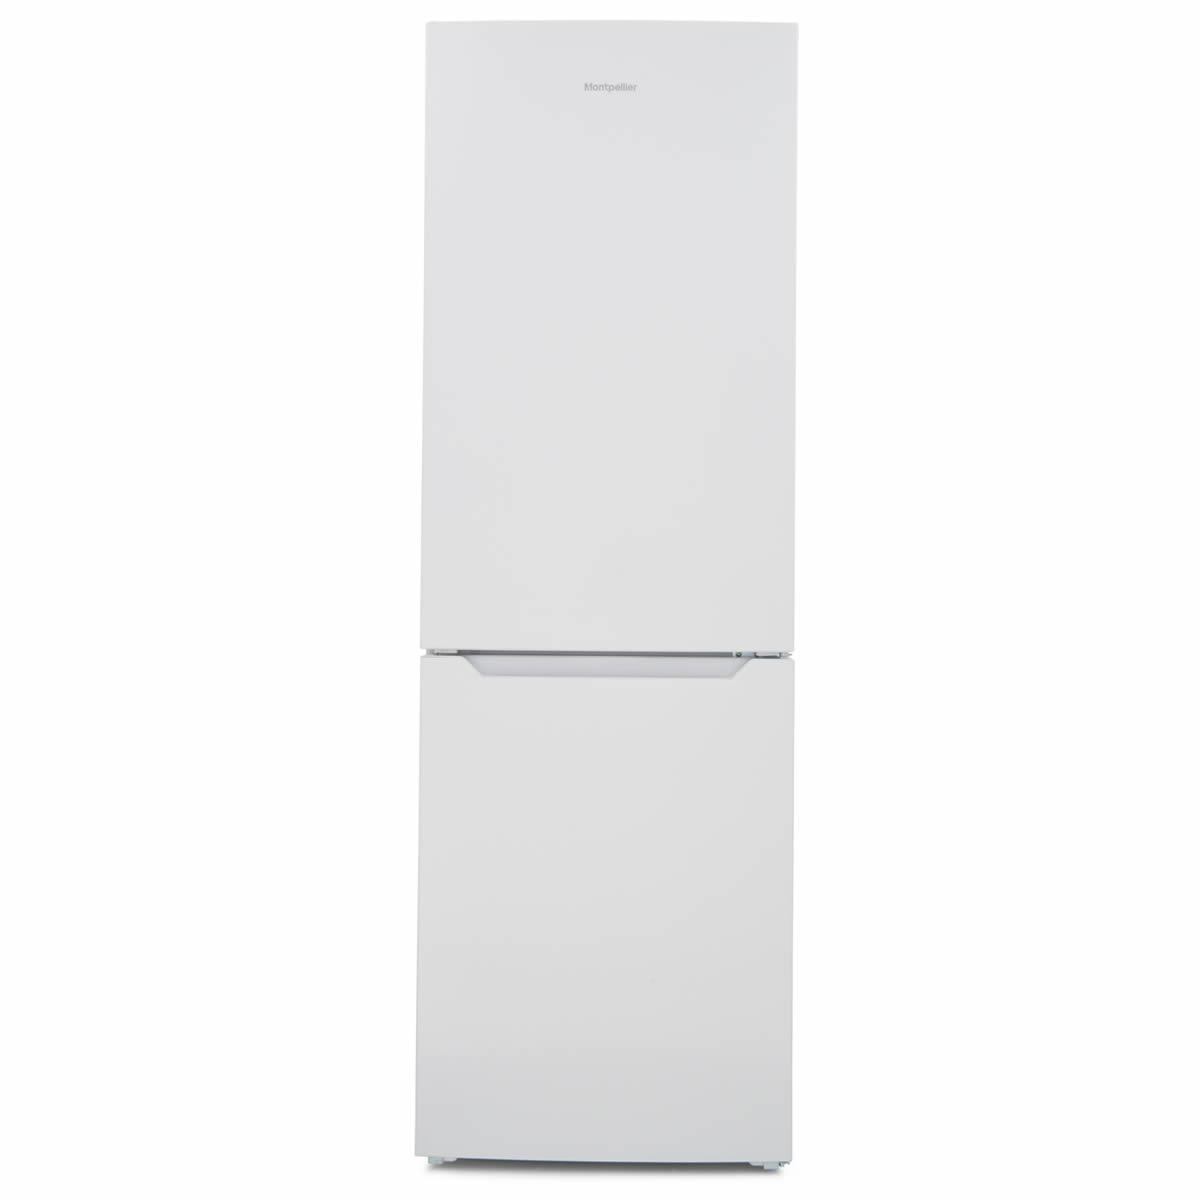 MS318MW 320litre Fridge Freezer NO FROST Class A+ White